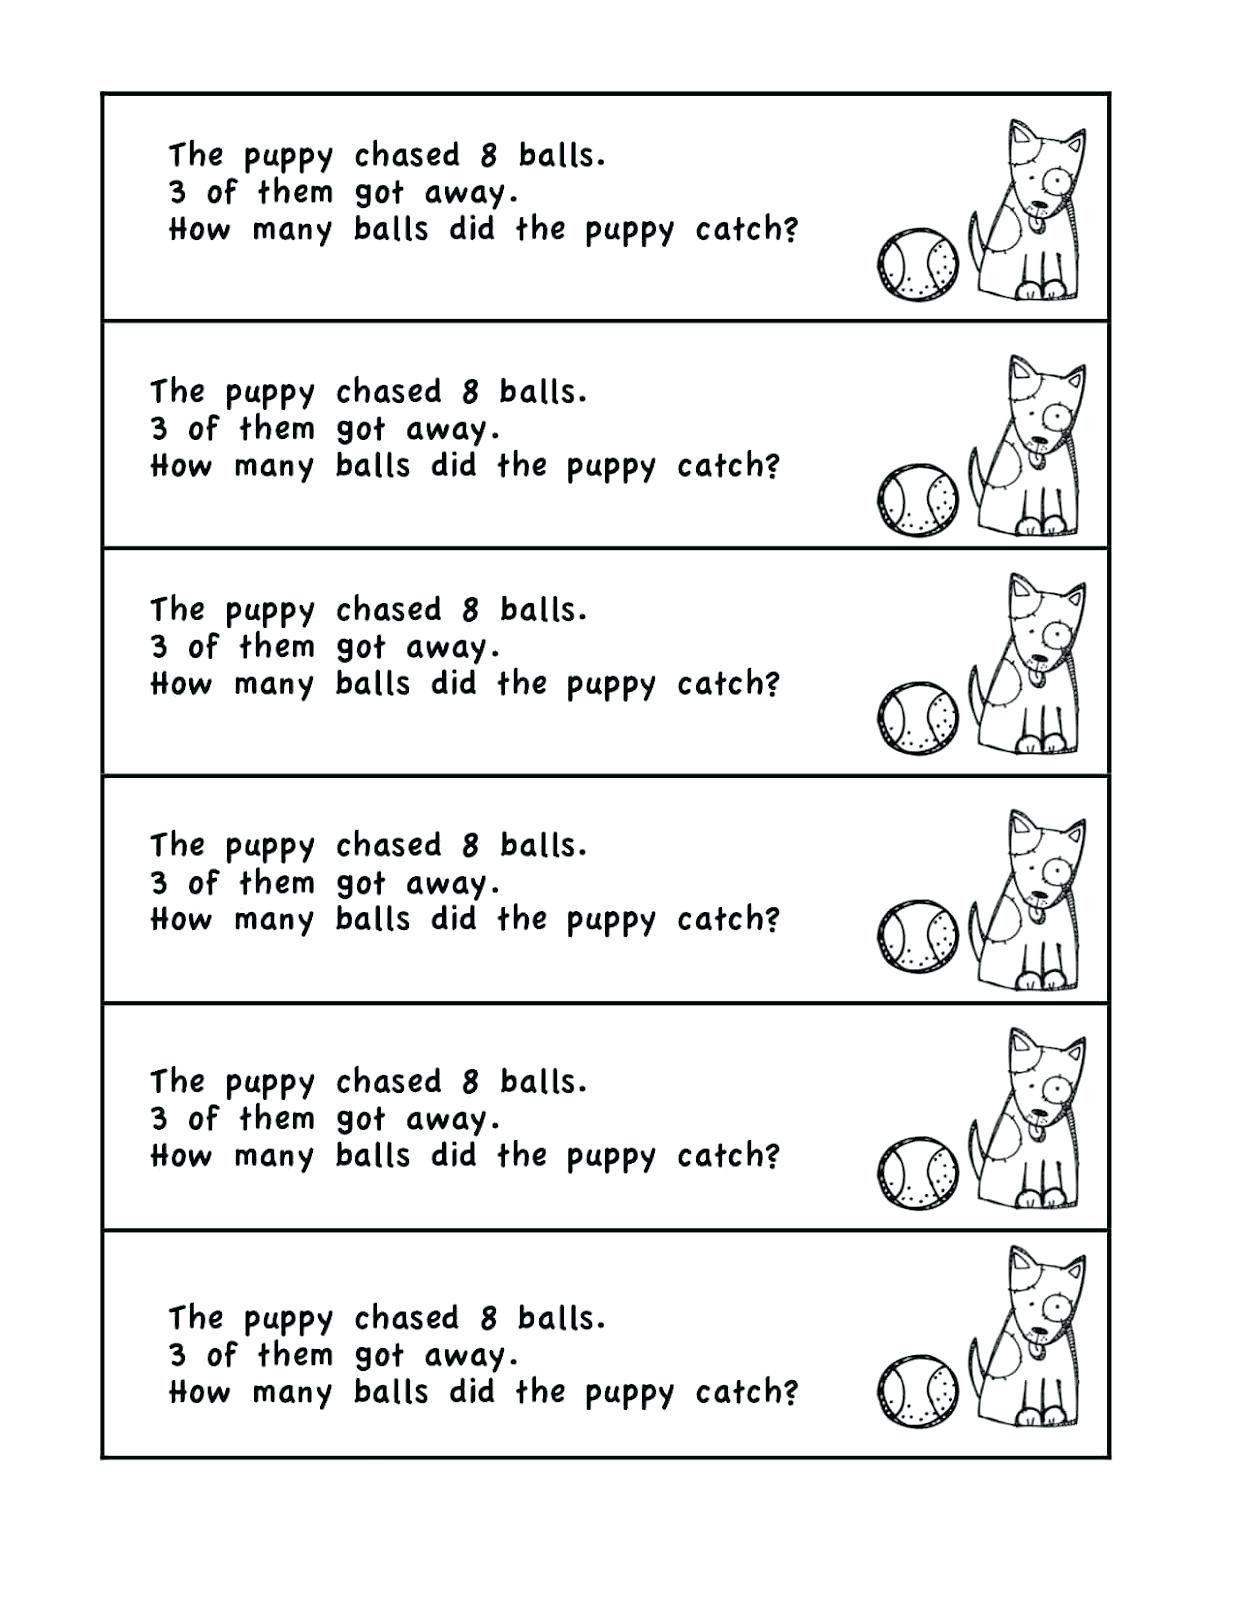 7 Math Problems For Grade 1